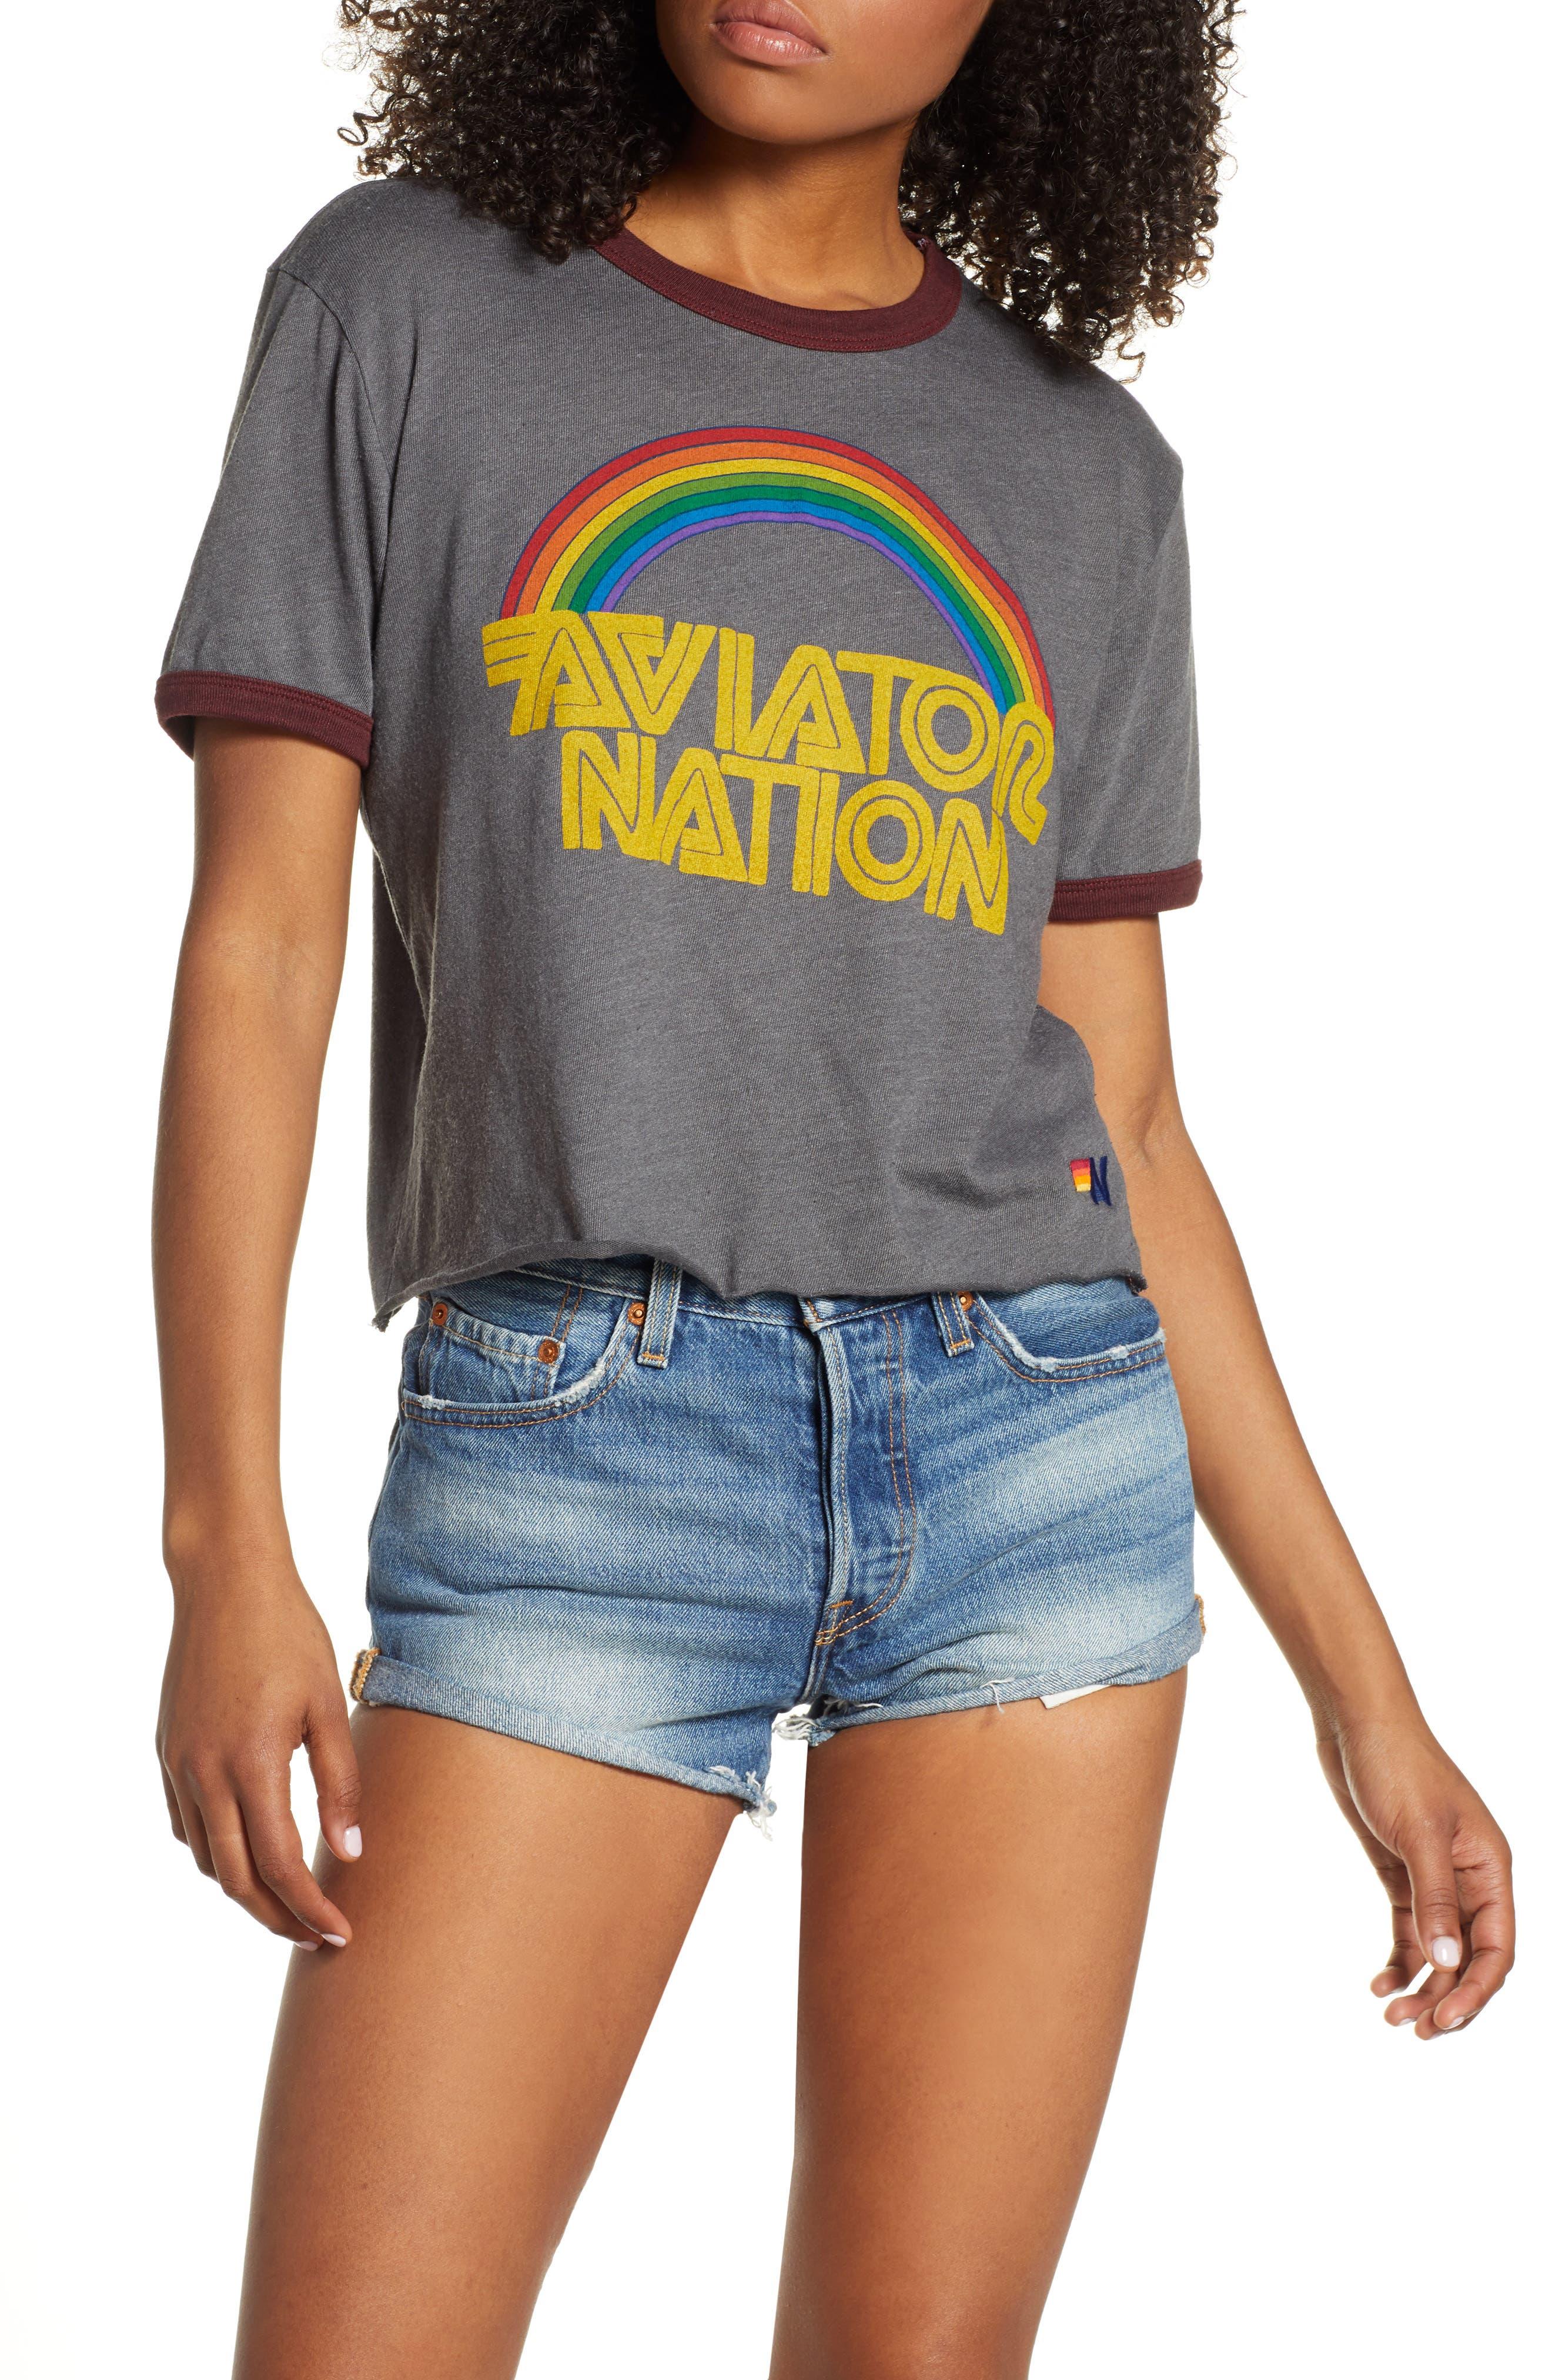 60s Shirts, T-shirt, Blouses | 70s Shirts, Tops, Vests Womens Aviator Nation 70S Boyfriend Ringer Tee $83.00 AT vintagedancer.com